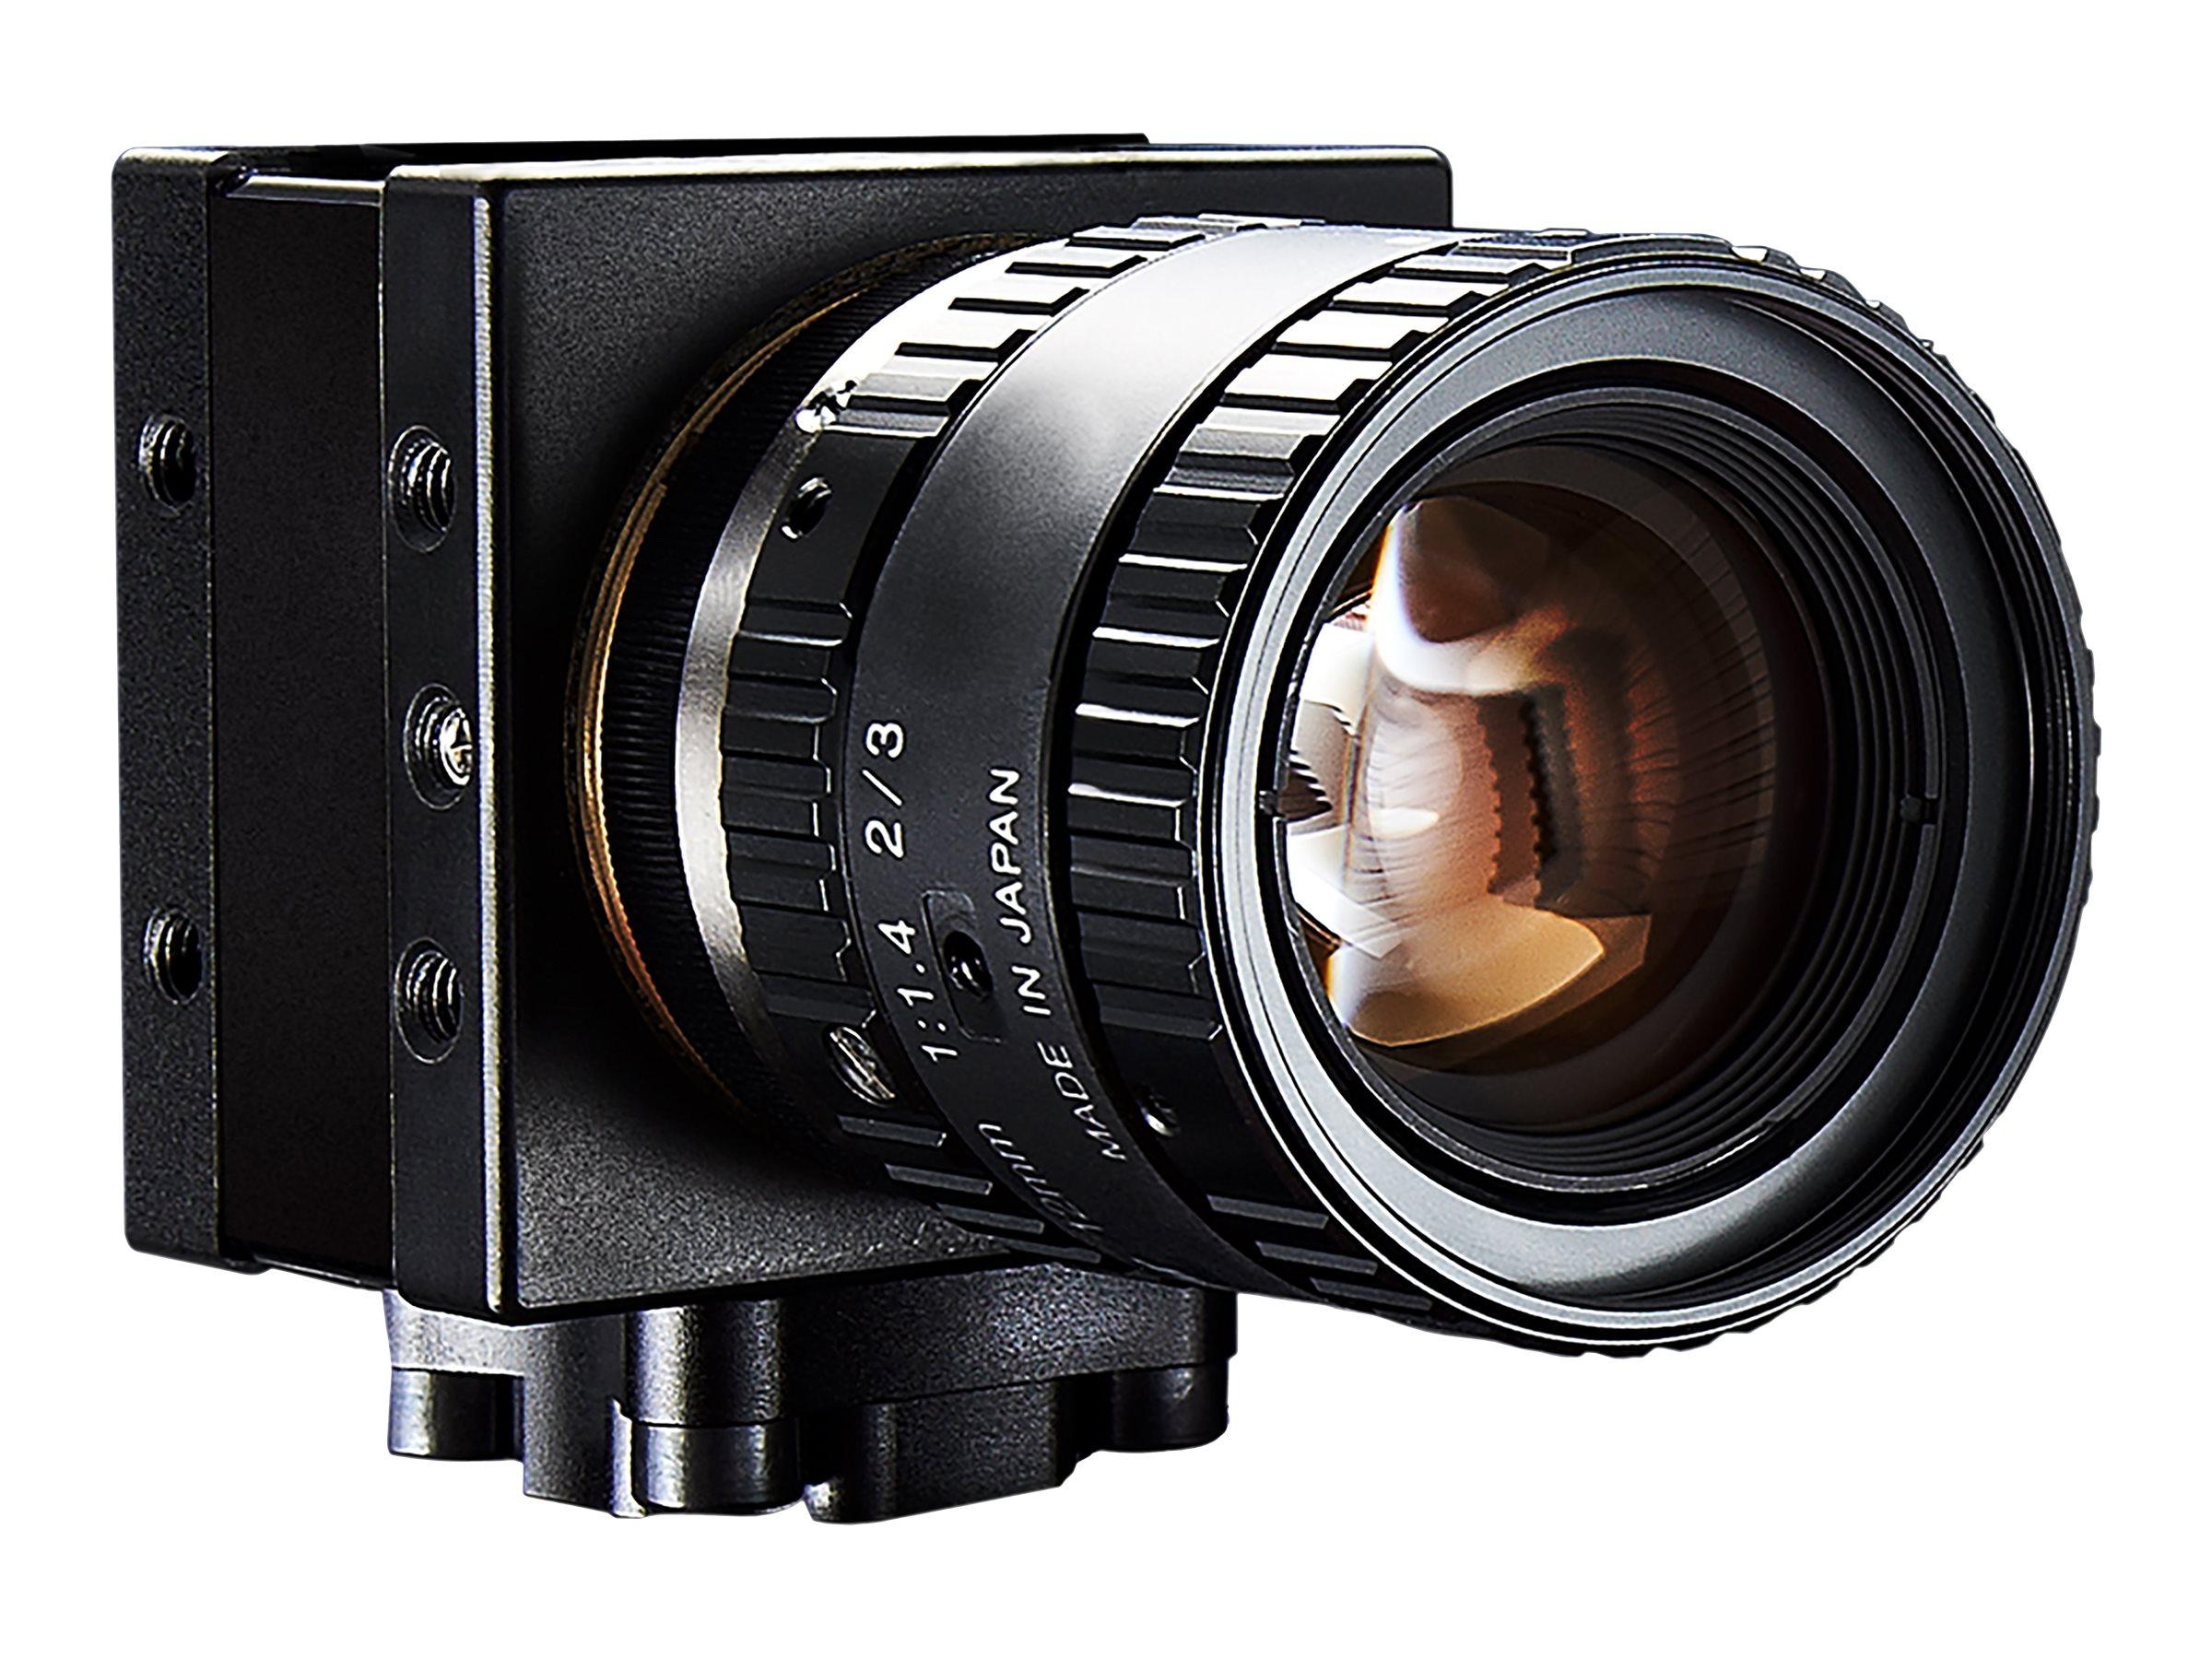 HP 3D Monochrome Camera Pro - 3D-Scanner - feststehend - CMOS - USB 3.0